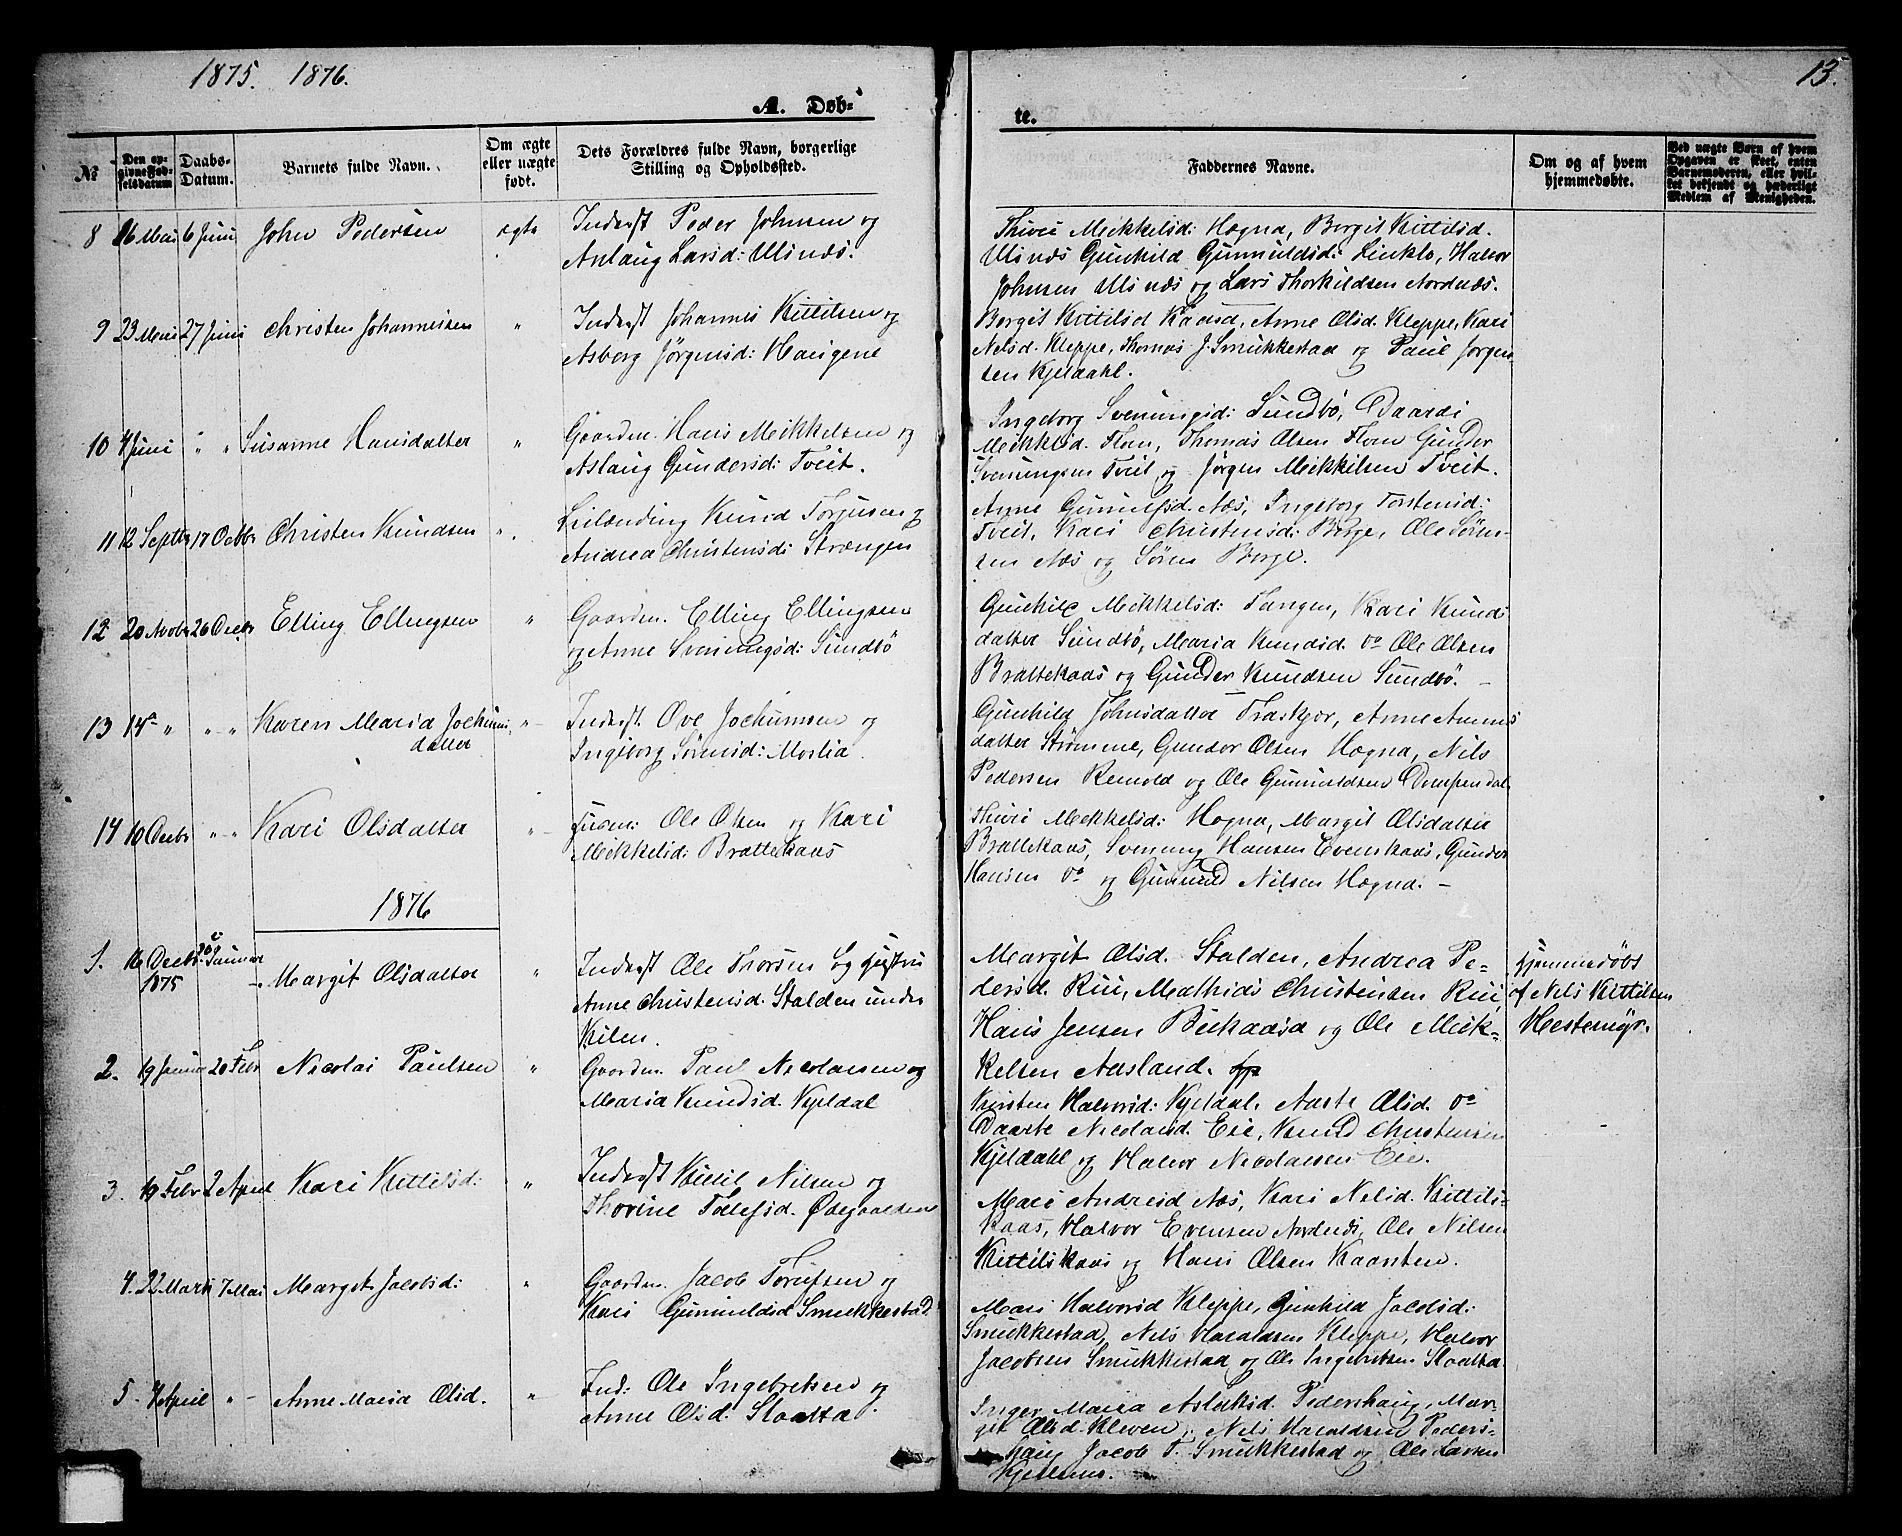 SAKO, Lunde kirkebøker, G/Gb/L0001: Klokkerbok nr. II 1, 1866-1887, s. 13